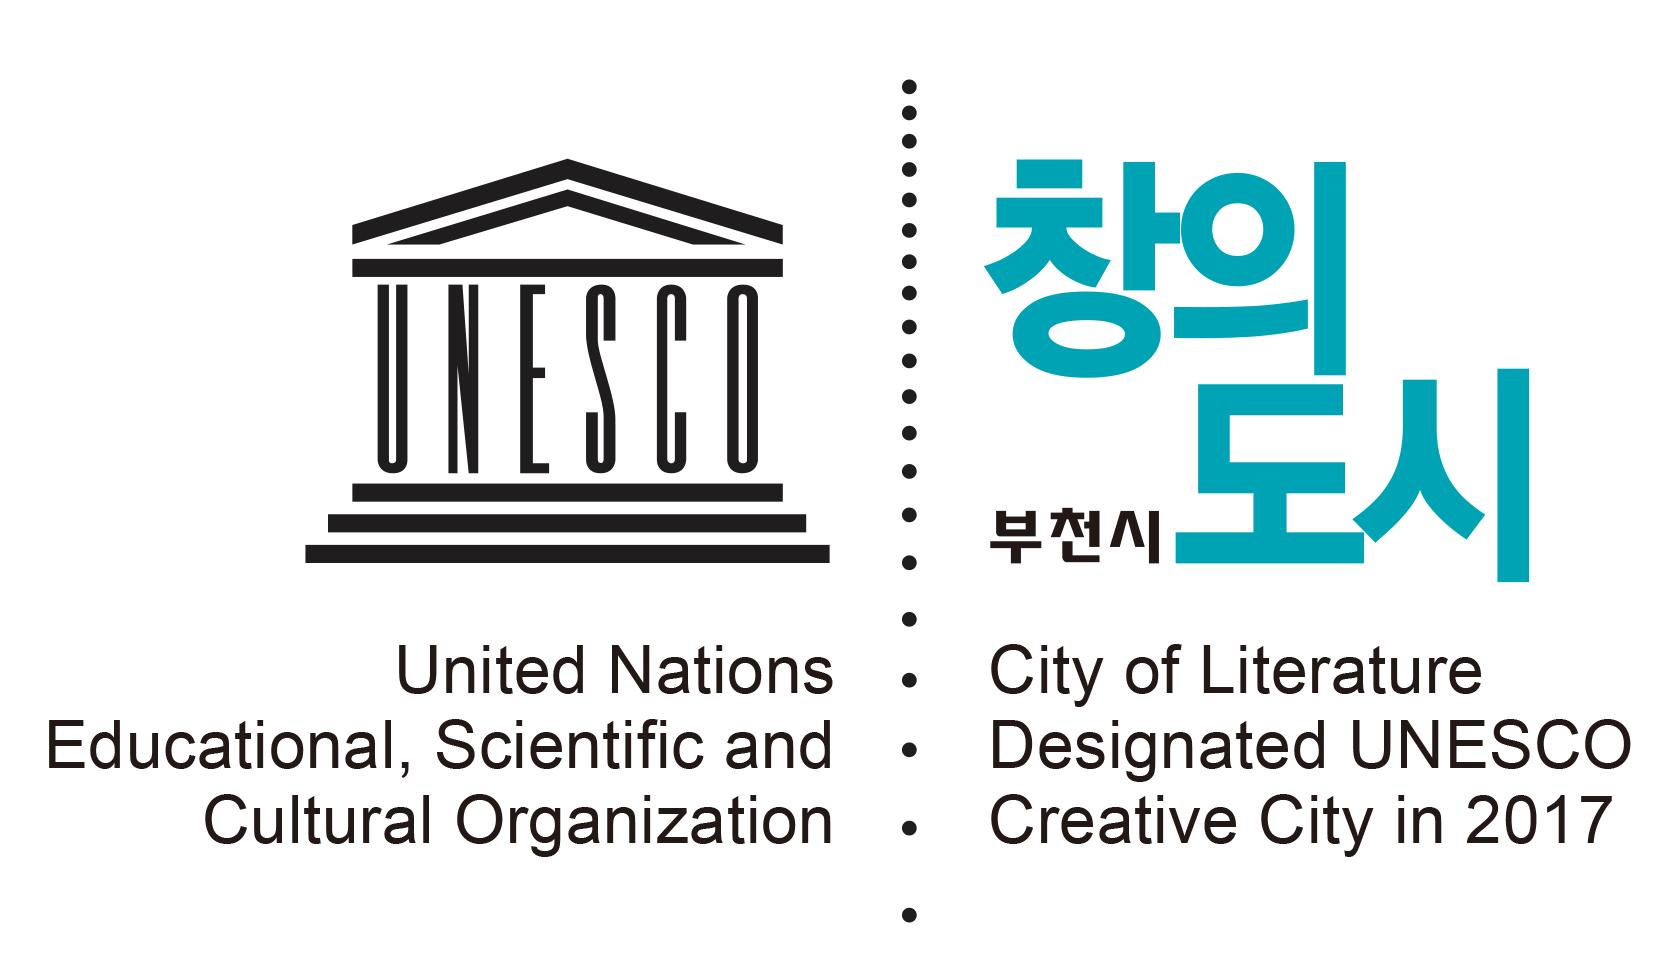 Bucheon, Korea's UNESCO City of Literature, seeks out comic creators for new Residency program